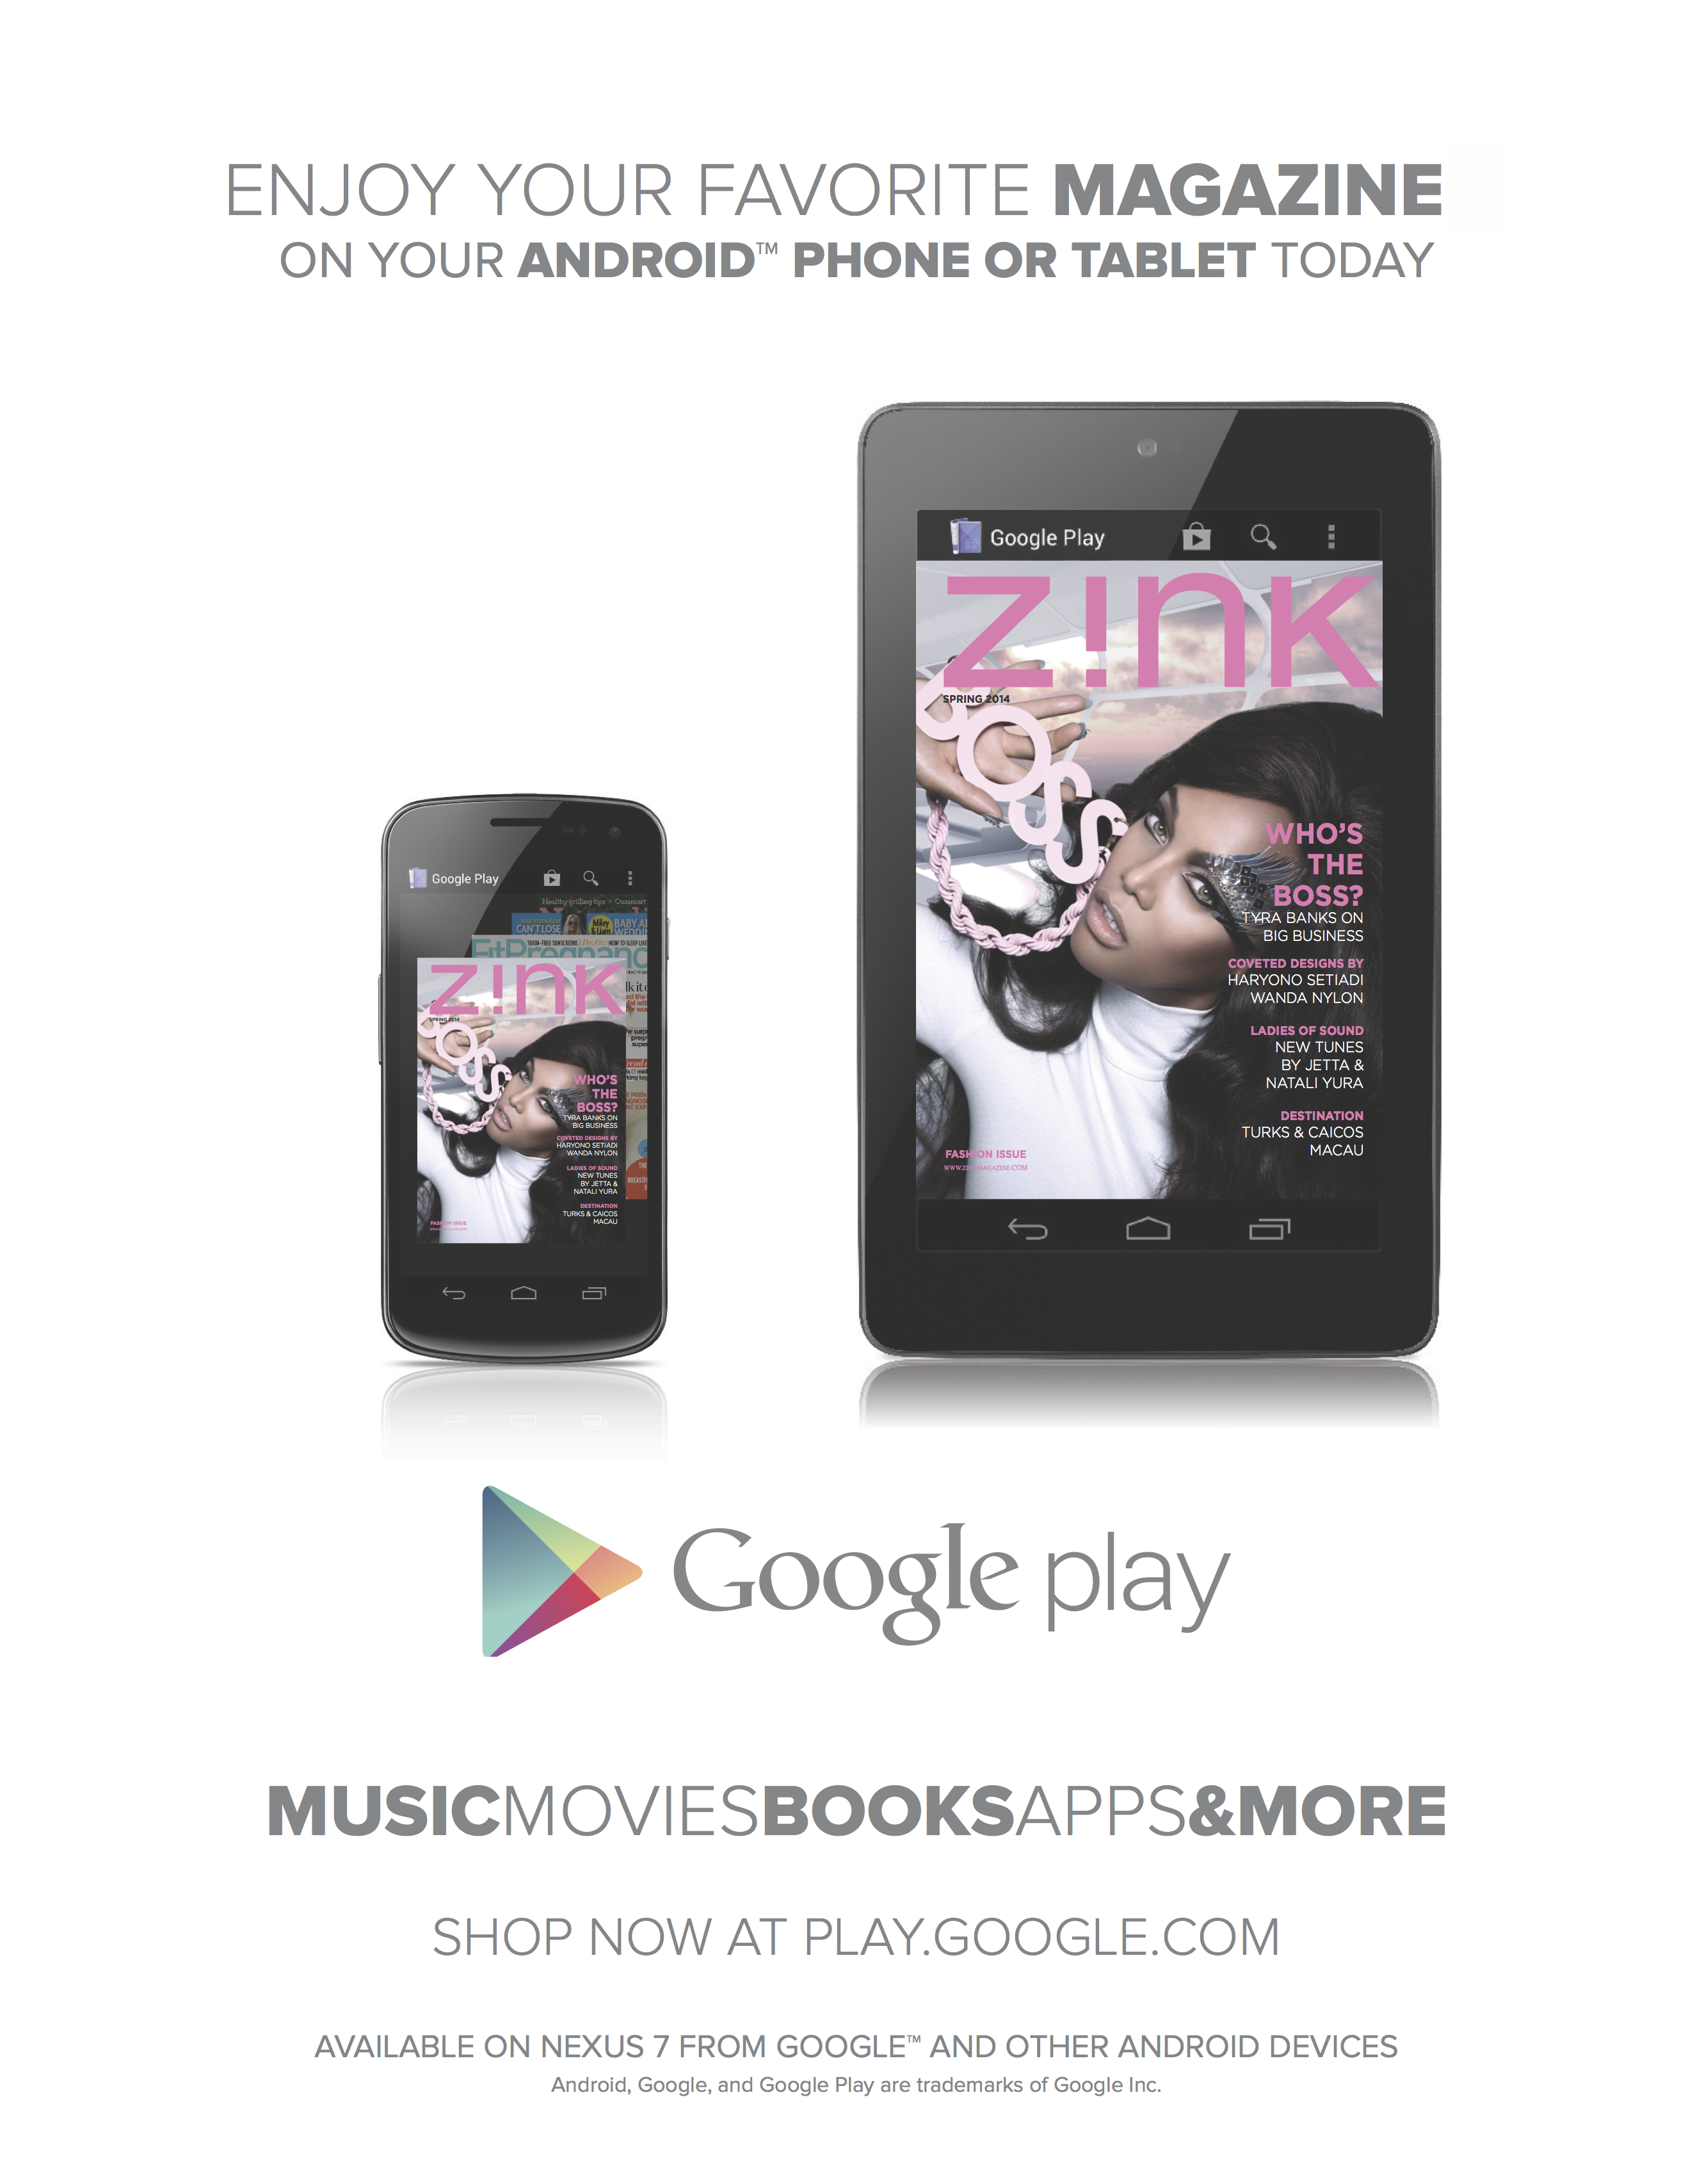 Google Play Ad - Z!NK Magazine